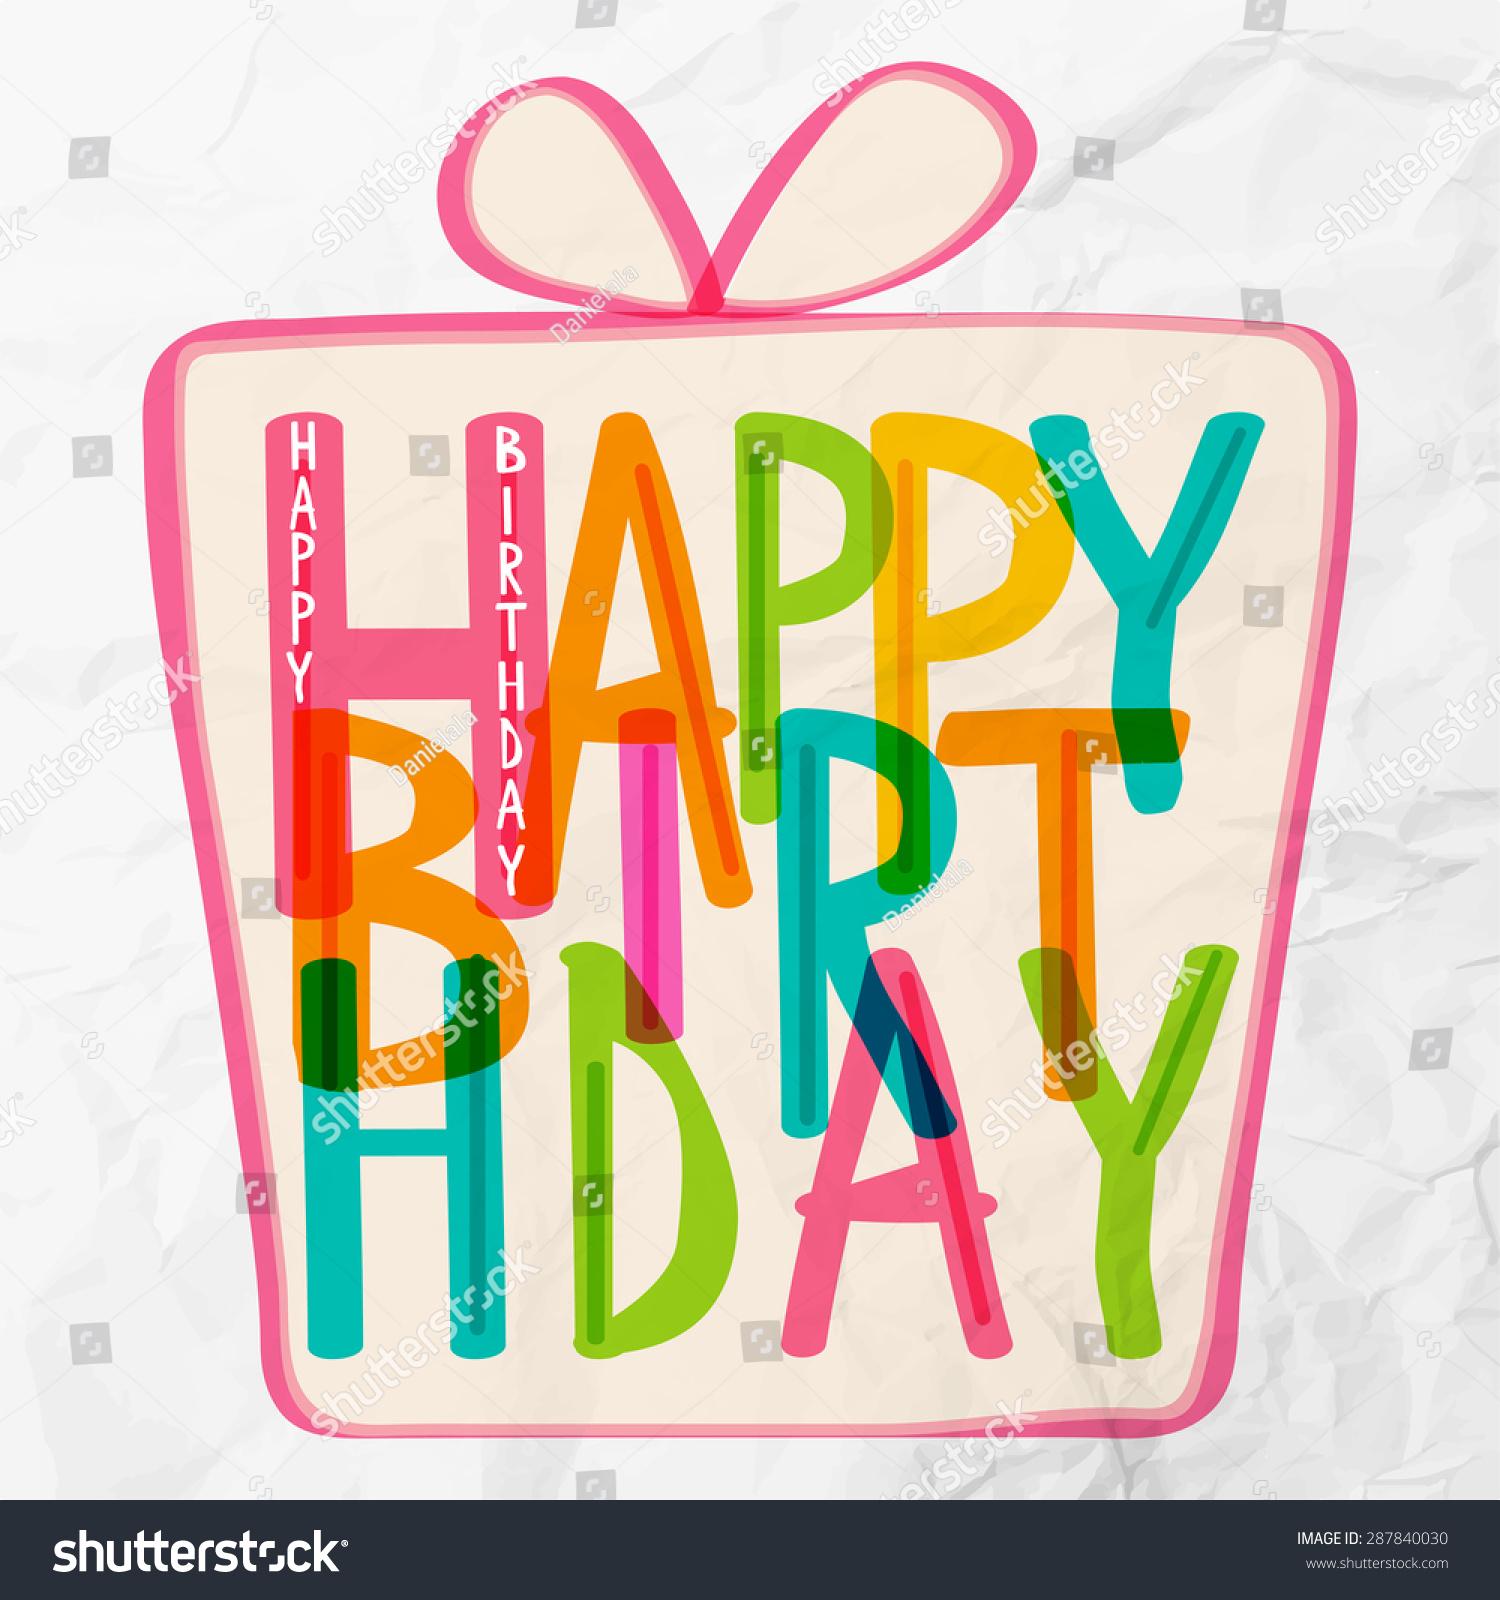 Happy birthday greetings stock vector 287840030 shutterstock happy birthday greetings kristyandbryce Gallery